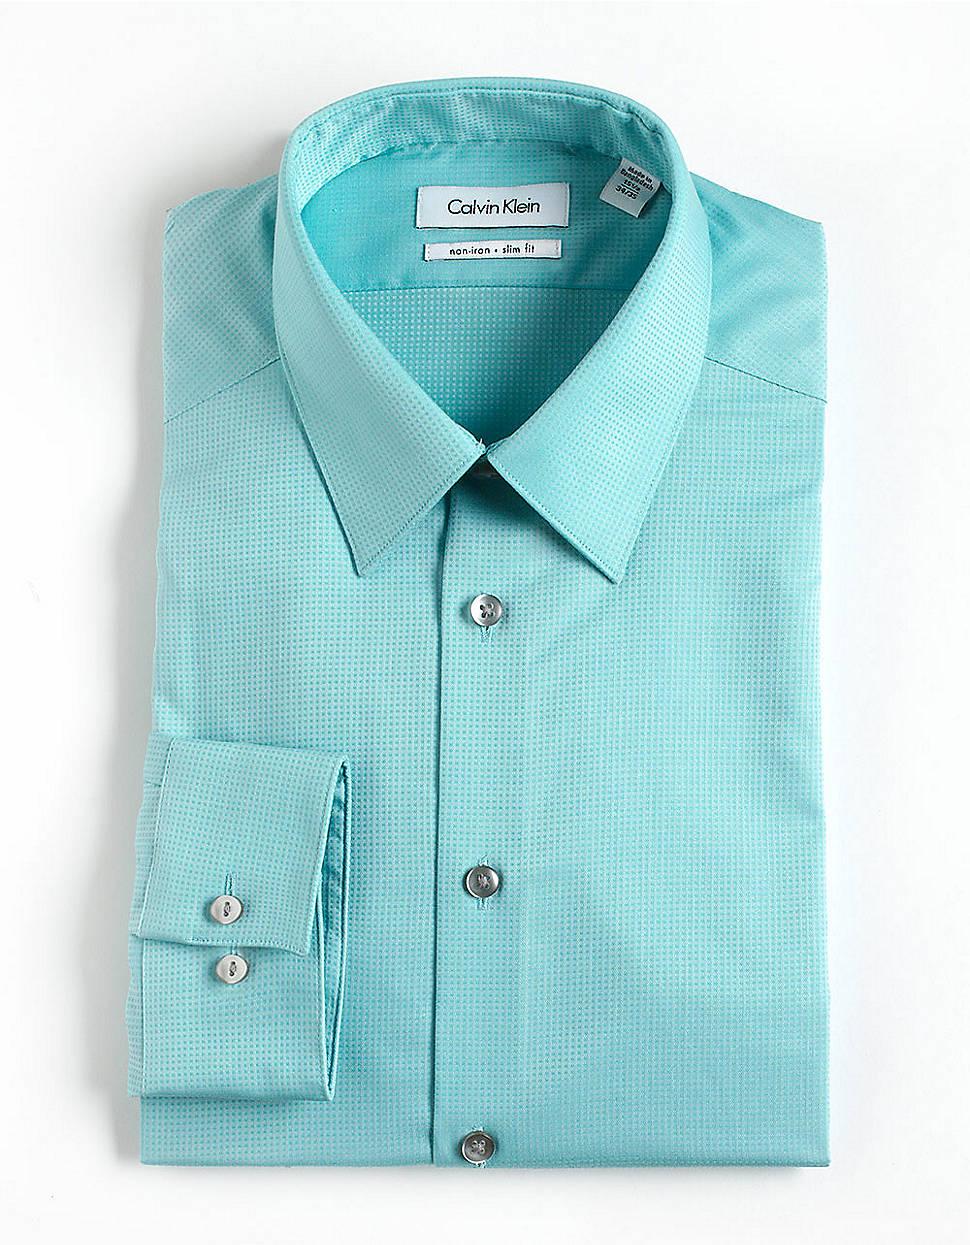 Lyst calvin klein textured striped cotton dress shirt in for Aqua blue mens dress shirt